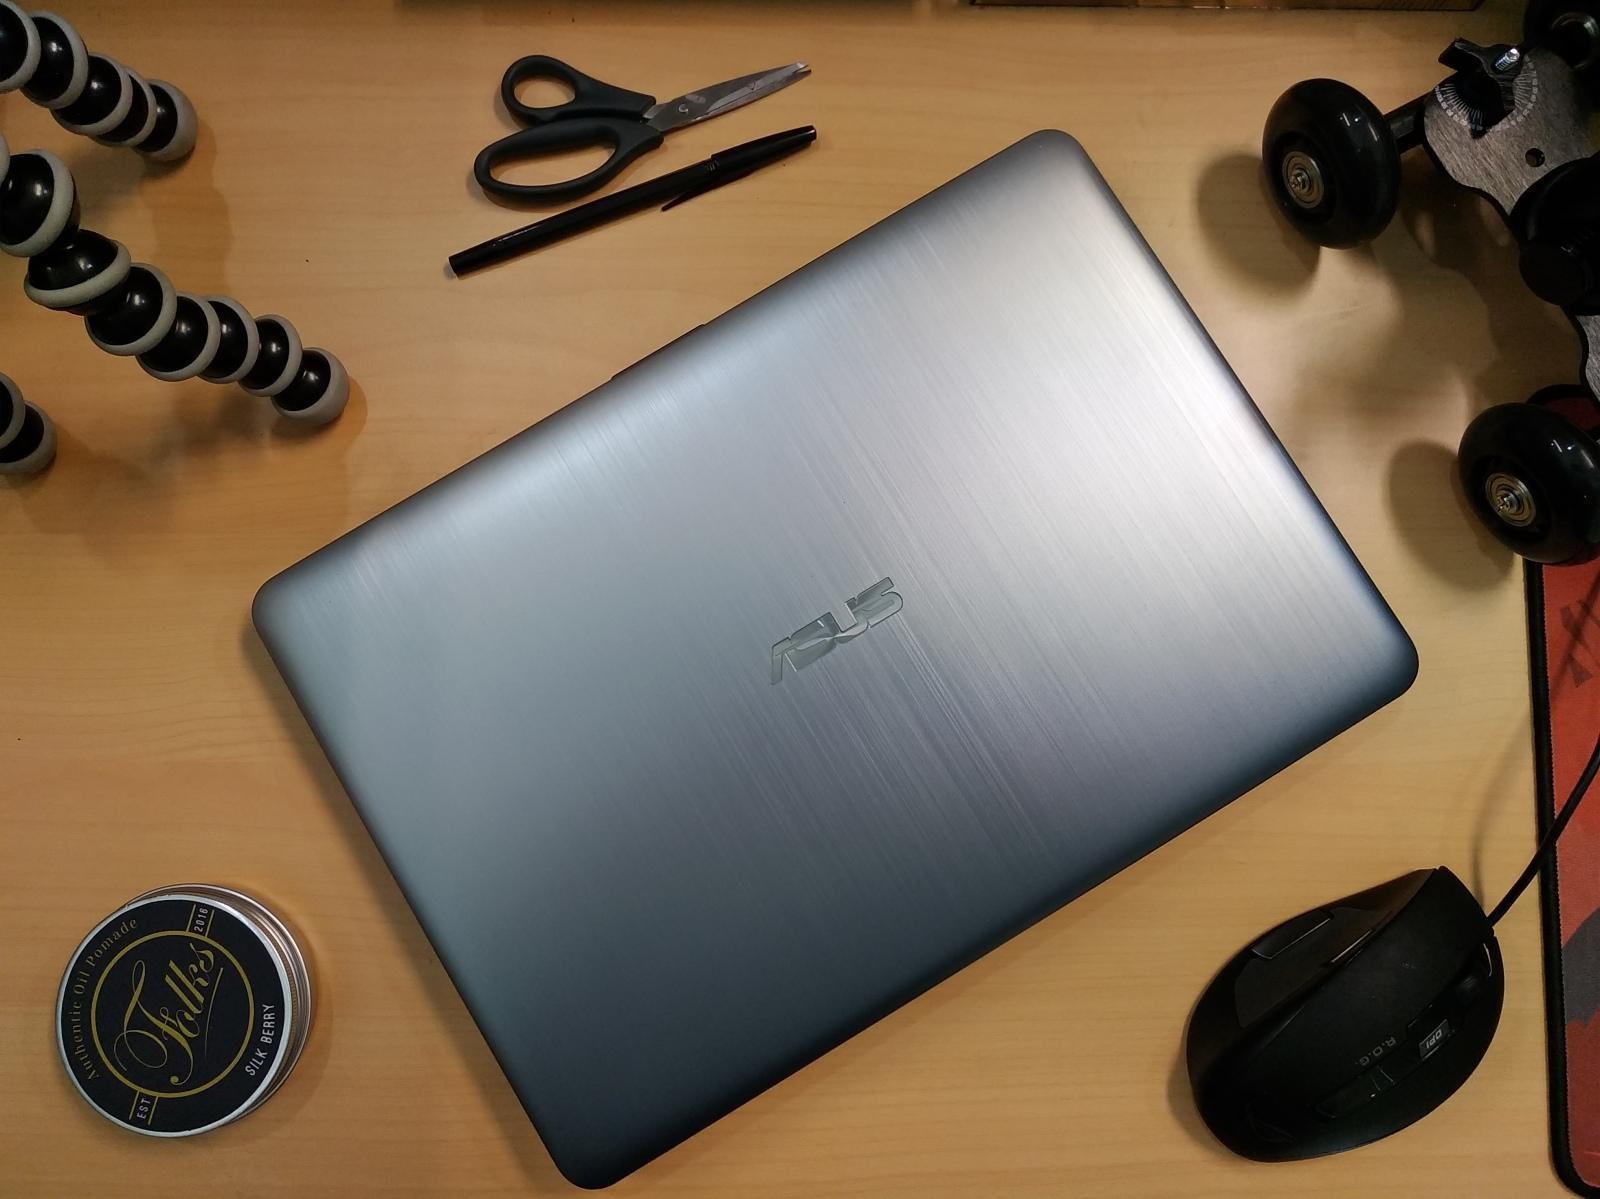 Harga Asus X441n Intel N3350 4gb 500gb 14 Inch Black Laptop Rog Gl 552 X Dm409t Core I7 7700 4096mb 1tb N Vidia Gtx950 X441na Ram4gb Windows10 Original Garansiresmi 2tahun